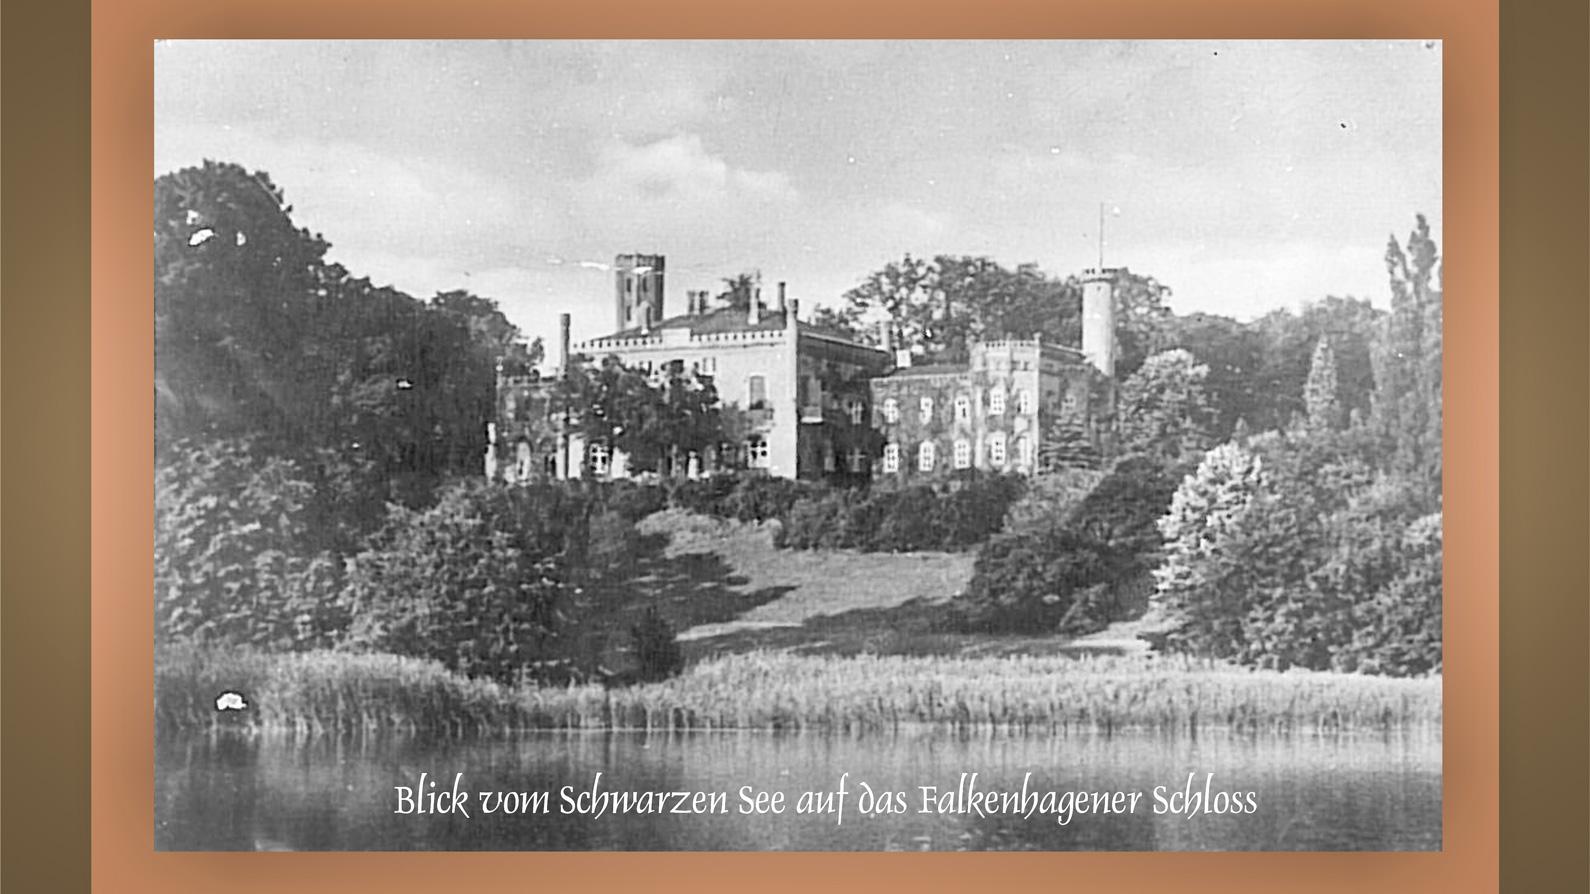 Schloss-Falkenhagen-vom-Schwarzen-See-aus-1